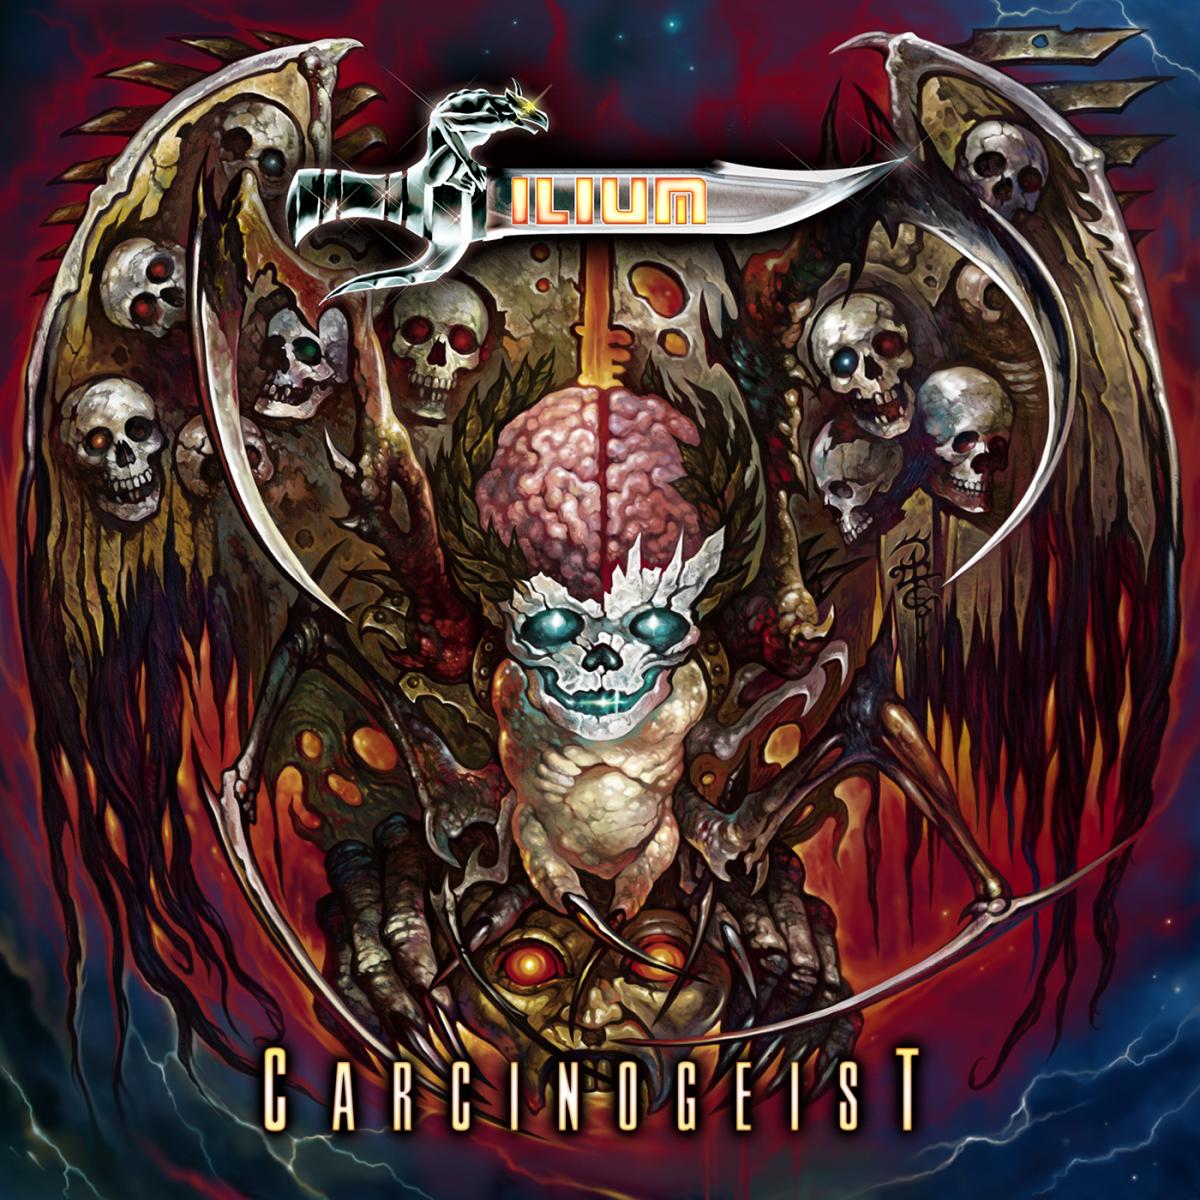 "Ilium ""Carcinogeist"" Album Review: Melodic Power Metal From Down Under"